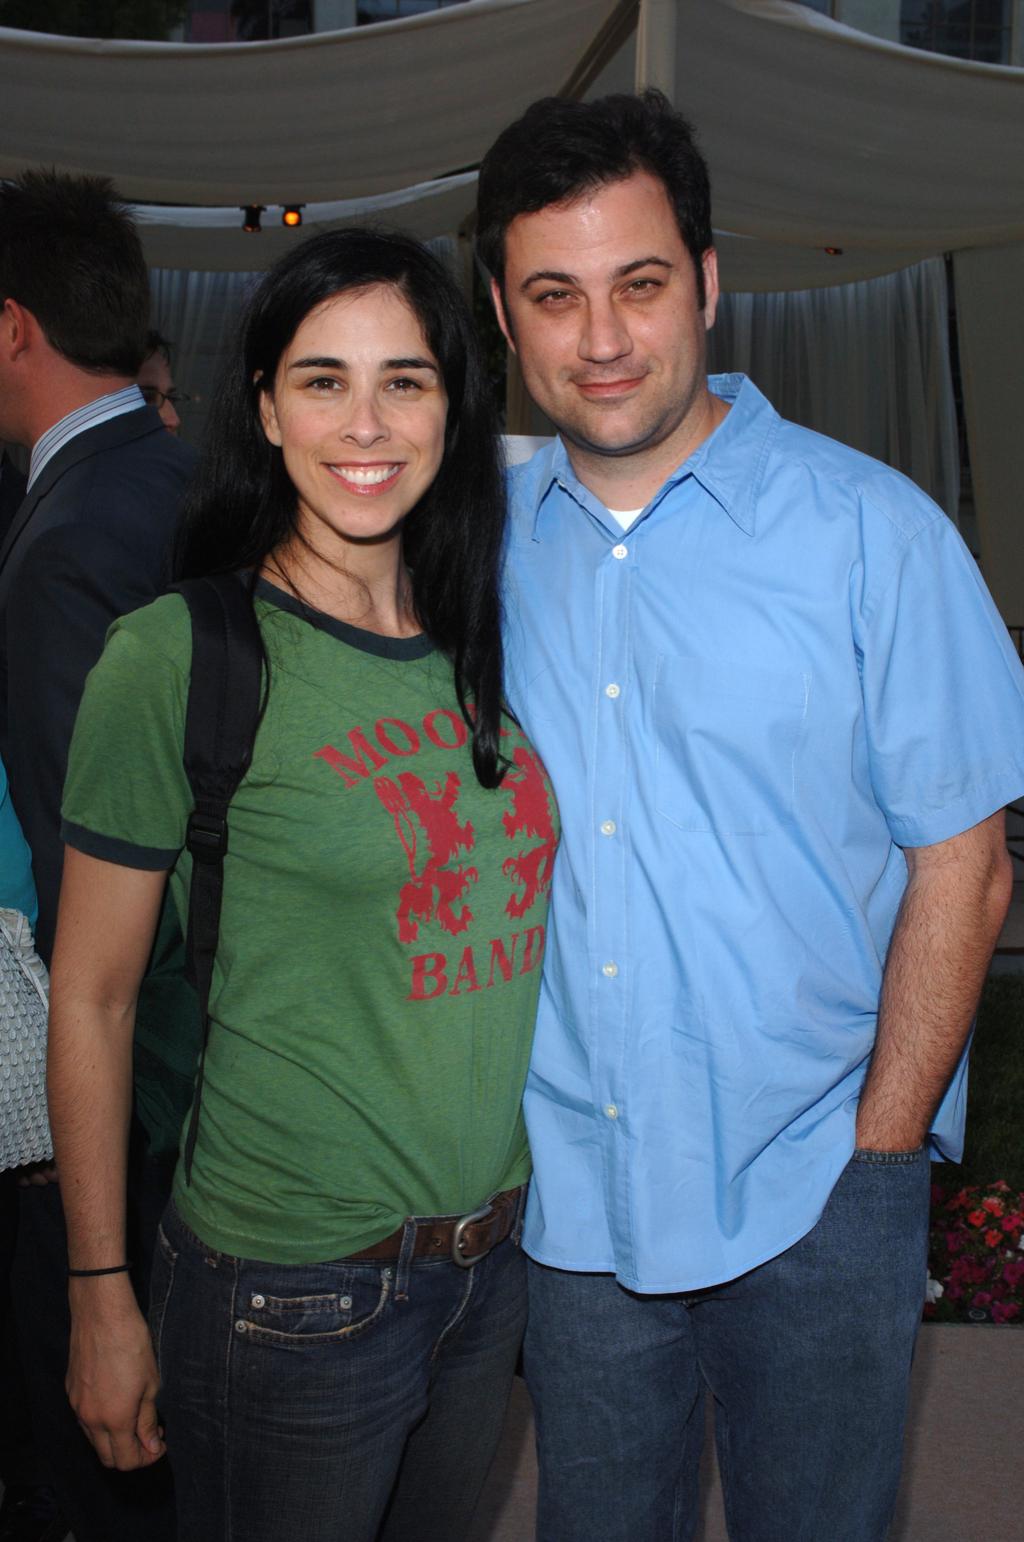 Jimmy Kimmel and Sarah Silverman Late Night